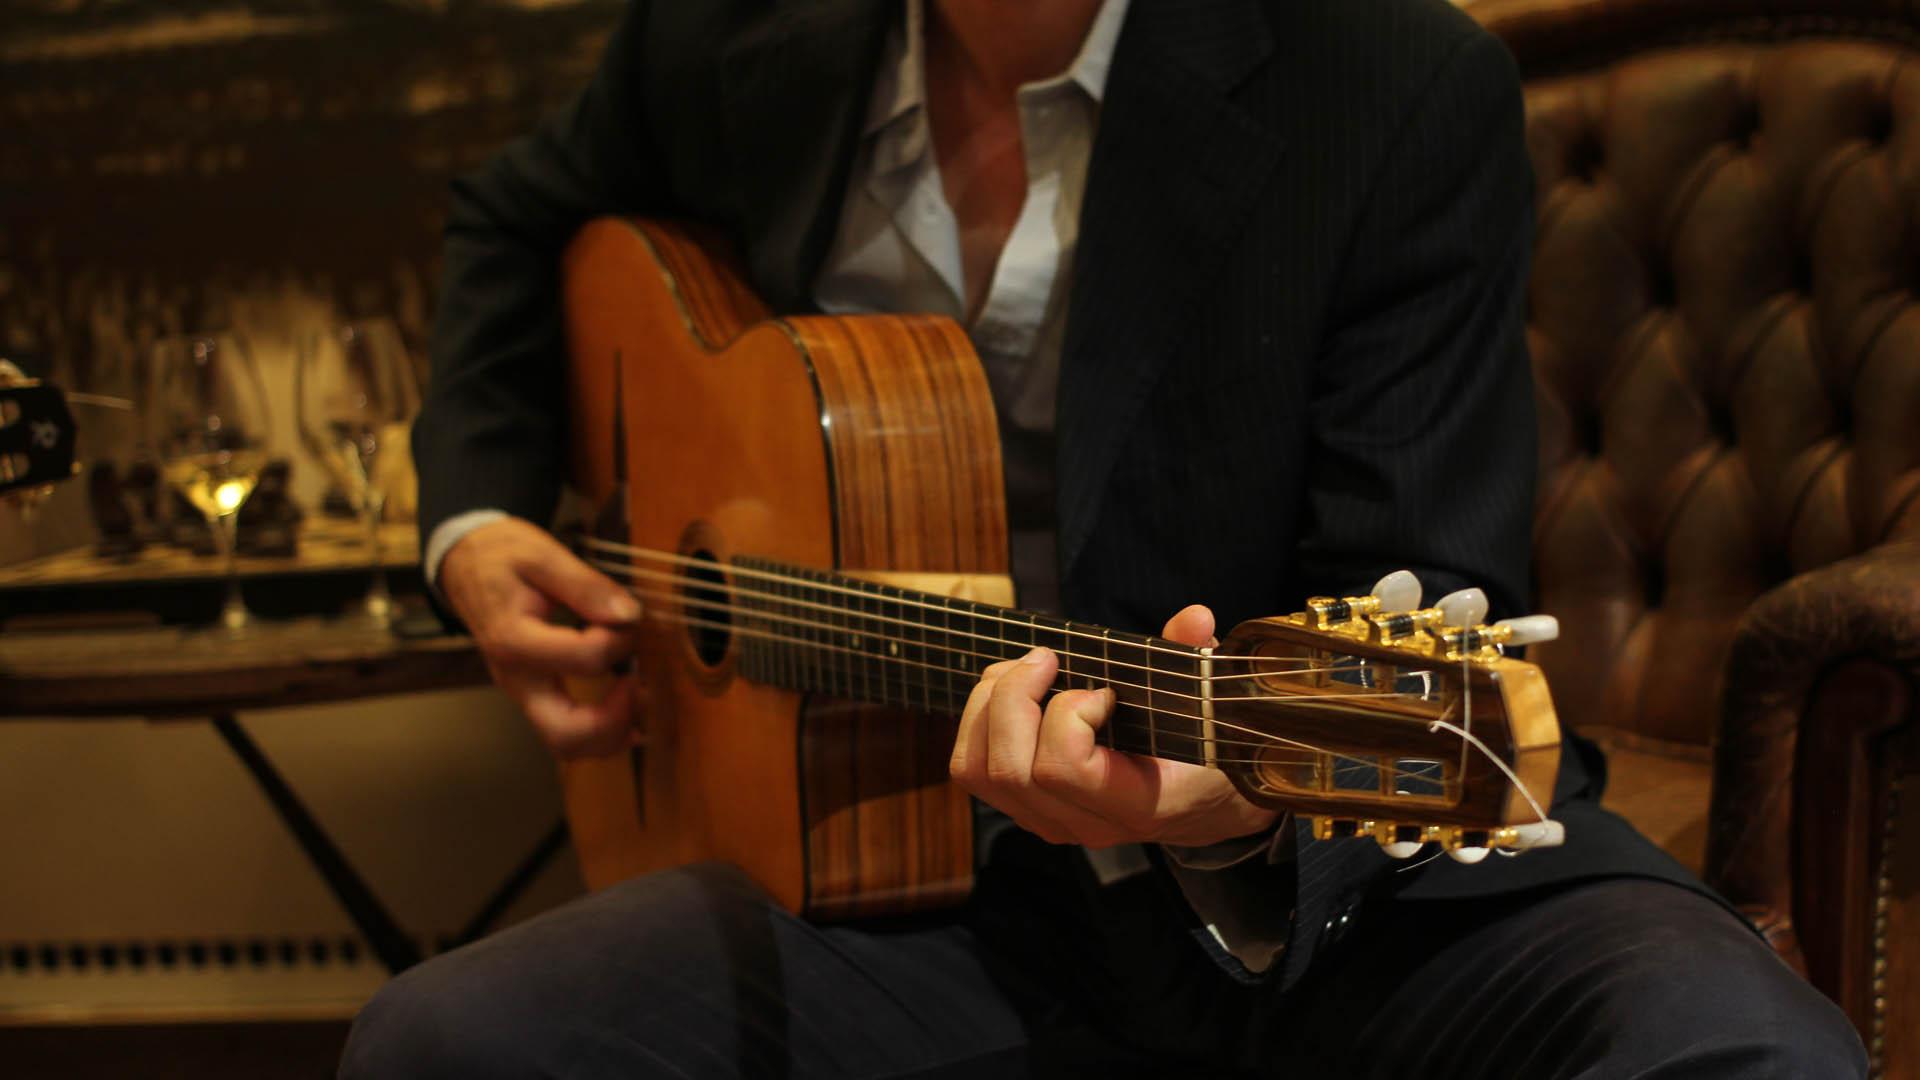 Rudy,Rabuffetti,Jérôme,Brajtman,jazz,manouche,django,grapelli,nuage,swing,minorswing,selmer,guitare,guitar,luthier